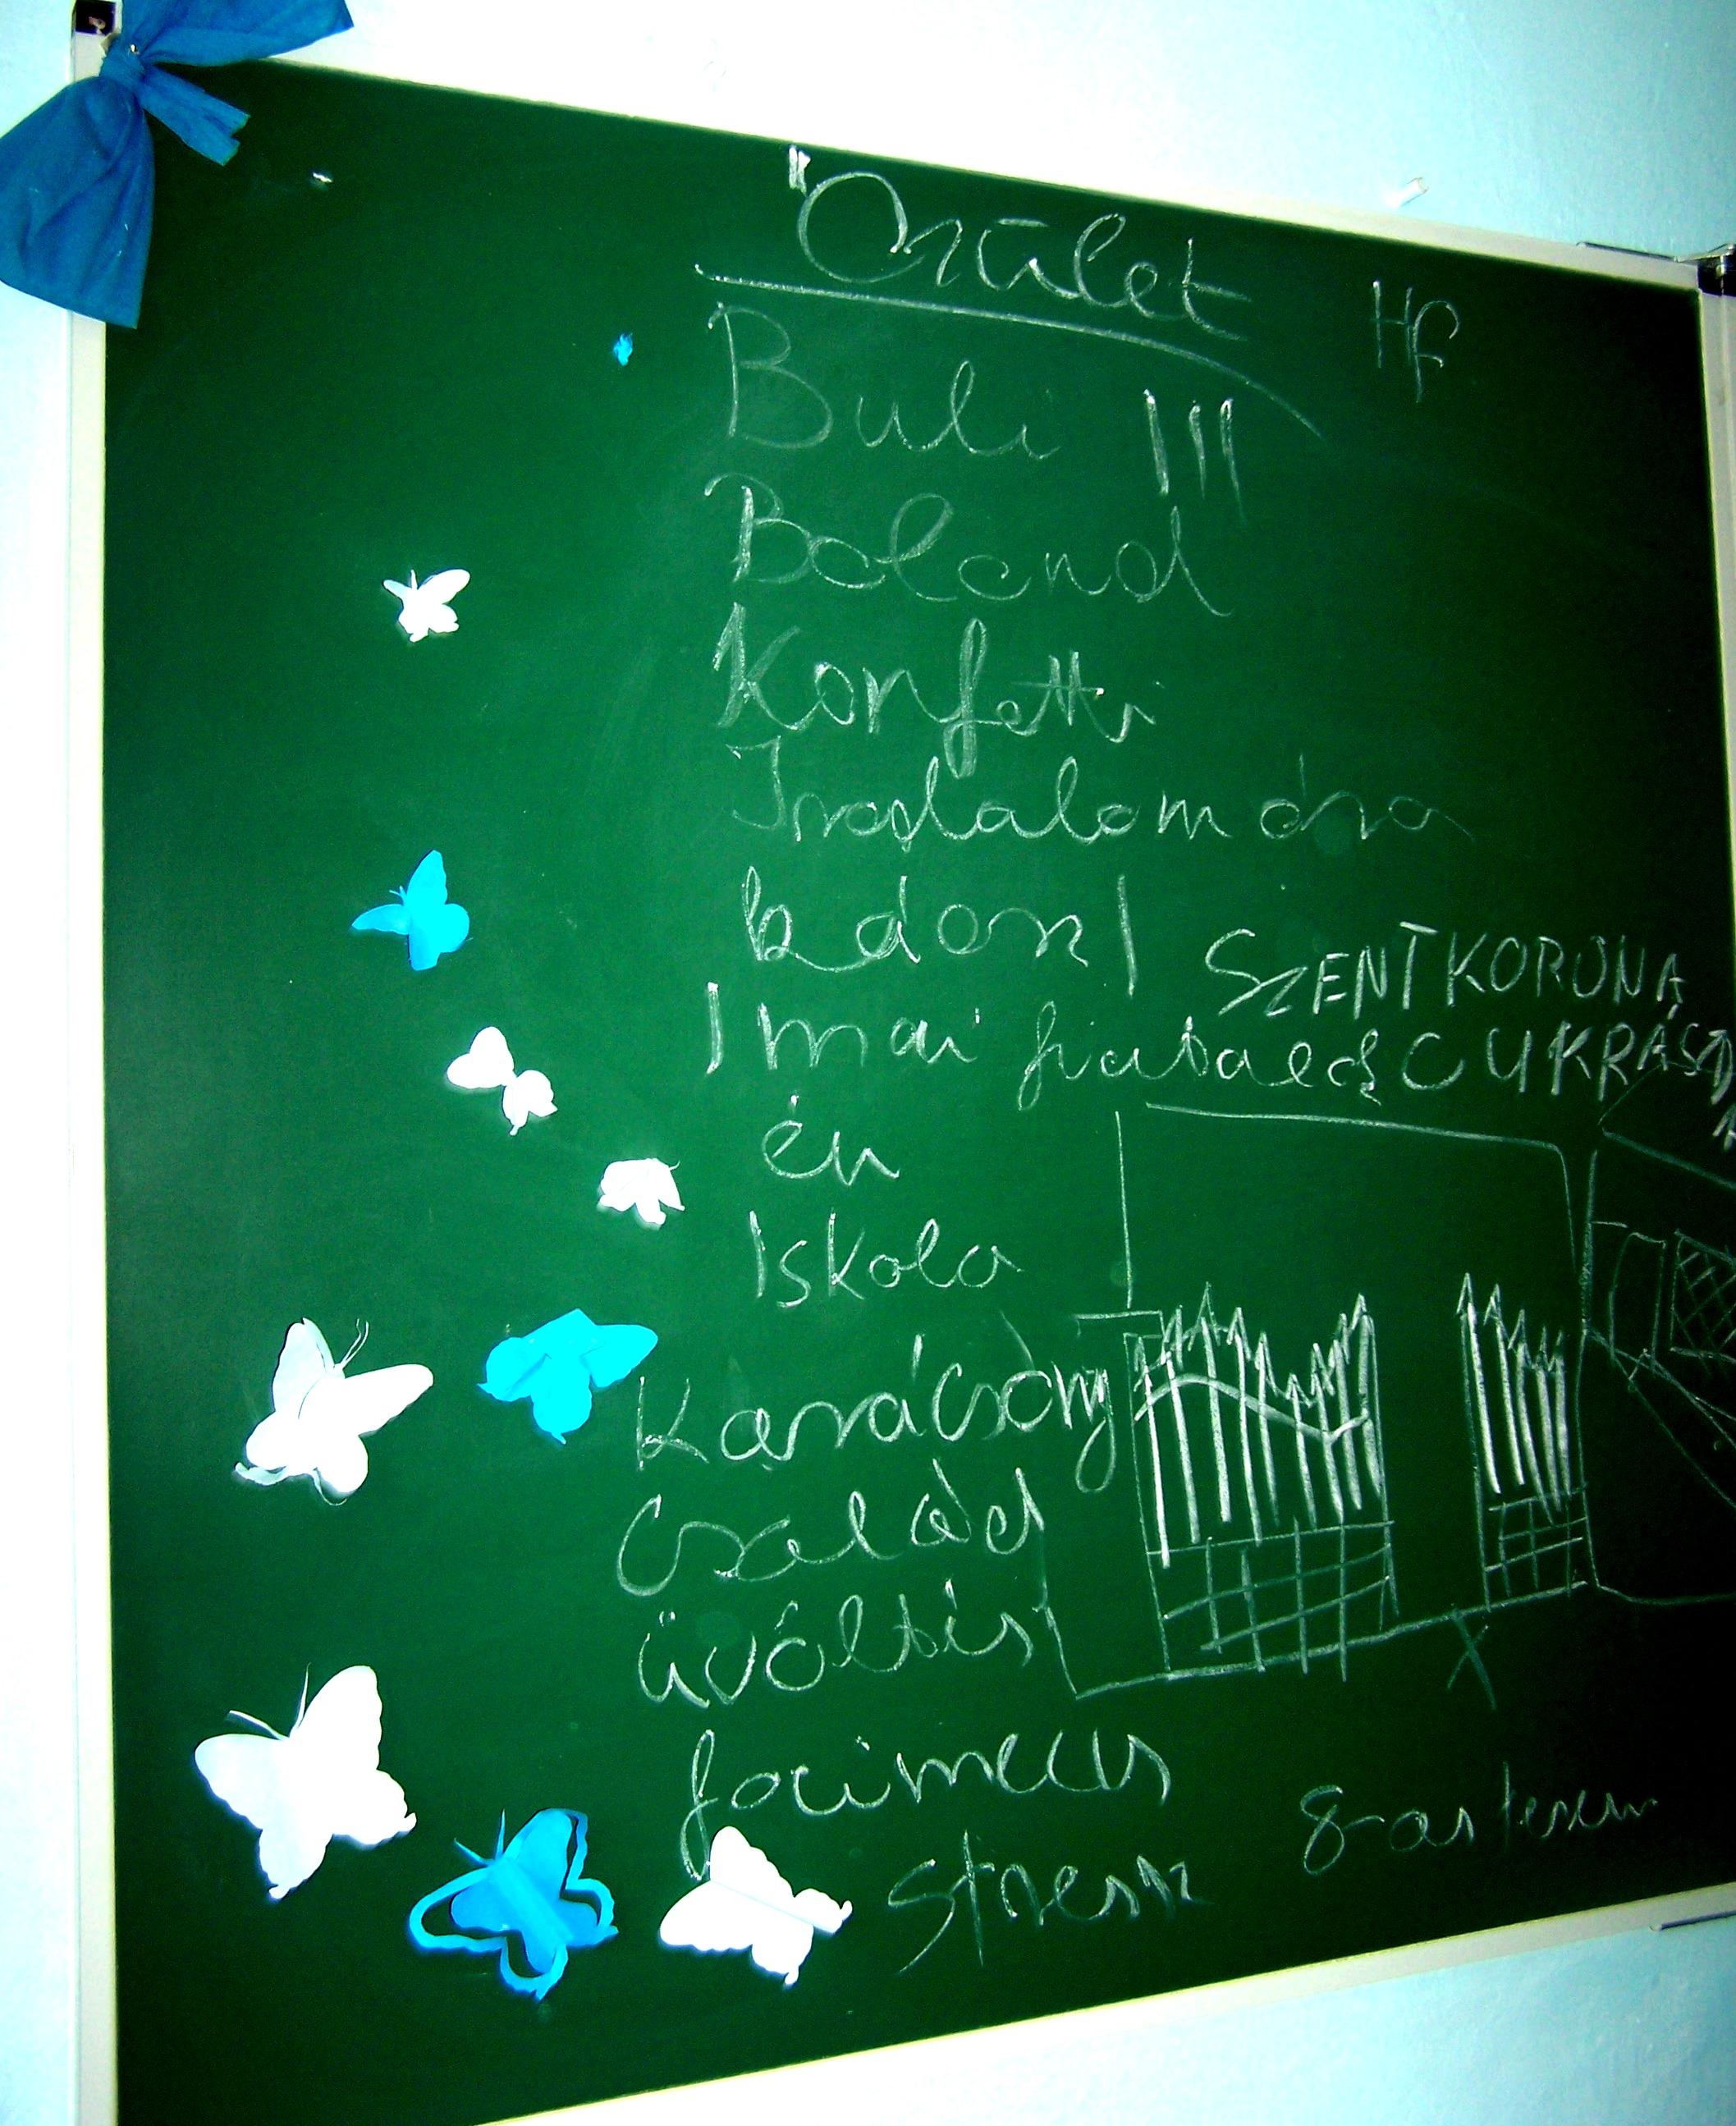 boros_fokus_orulet_brainstorming.JPG